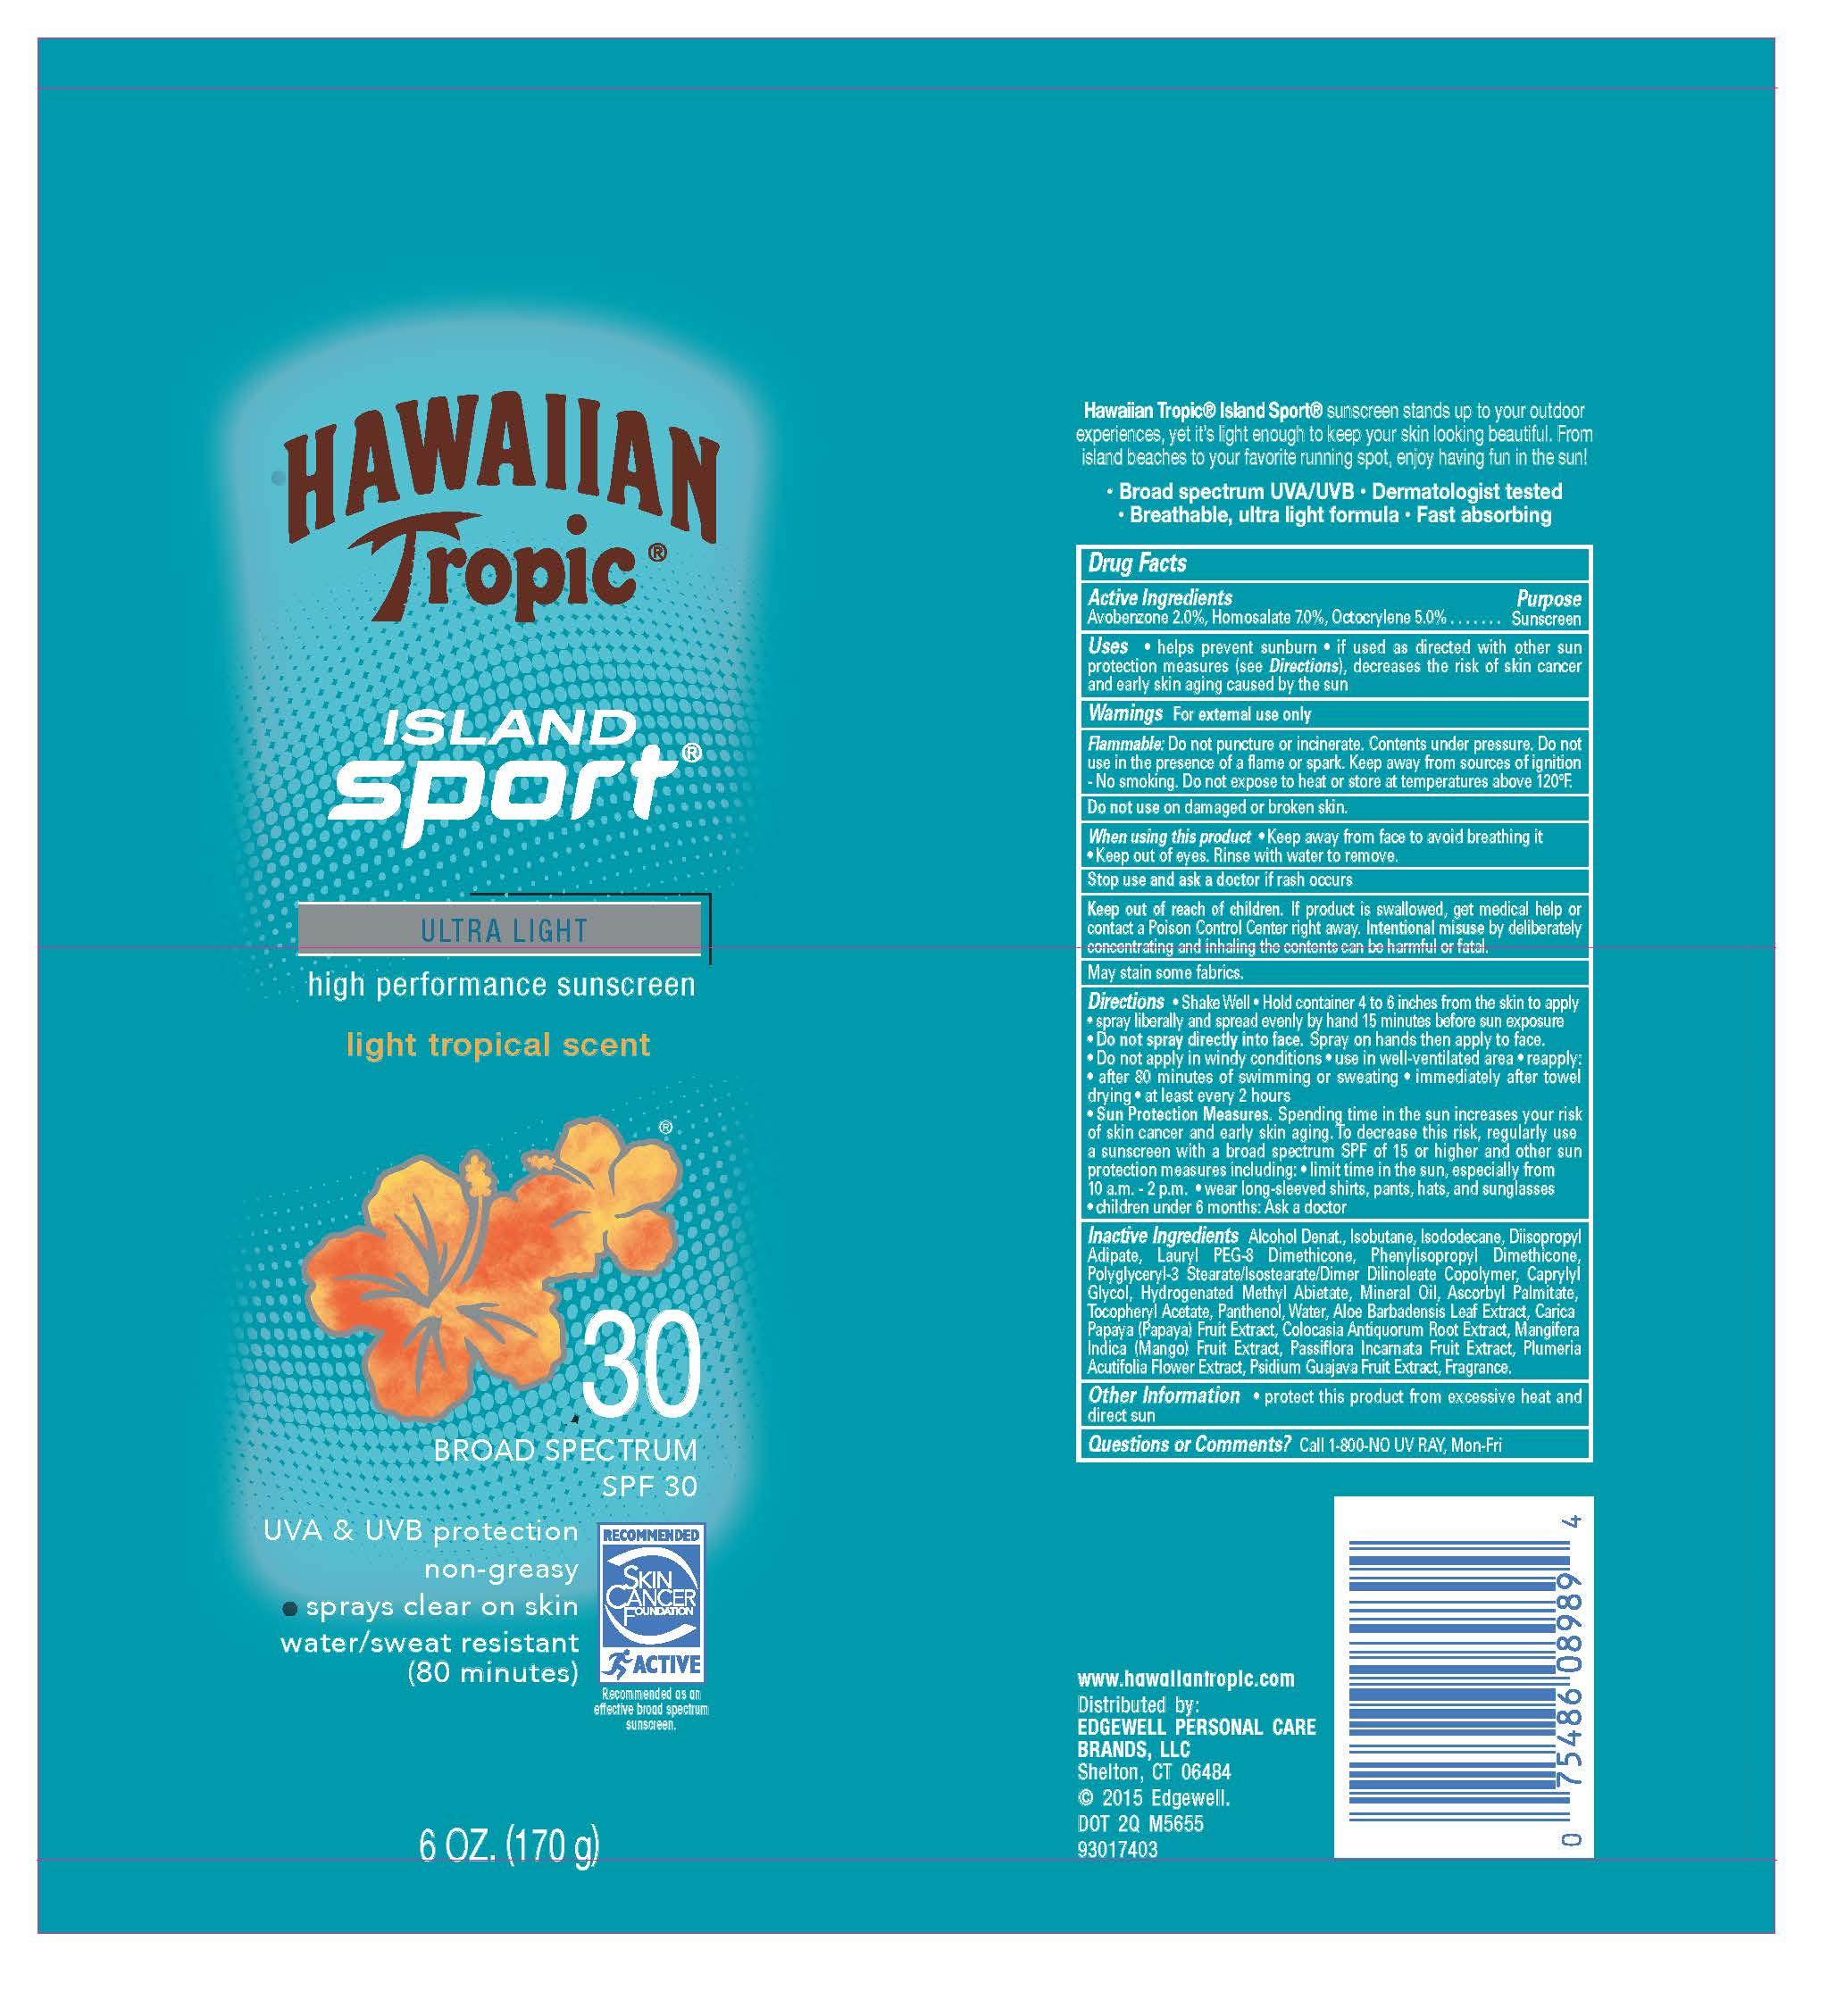 Hawaiian Tropic (Avobenzone Homosalate Octocrylene) Spray [Energizer Personal Care Llc]